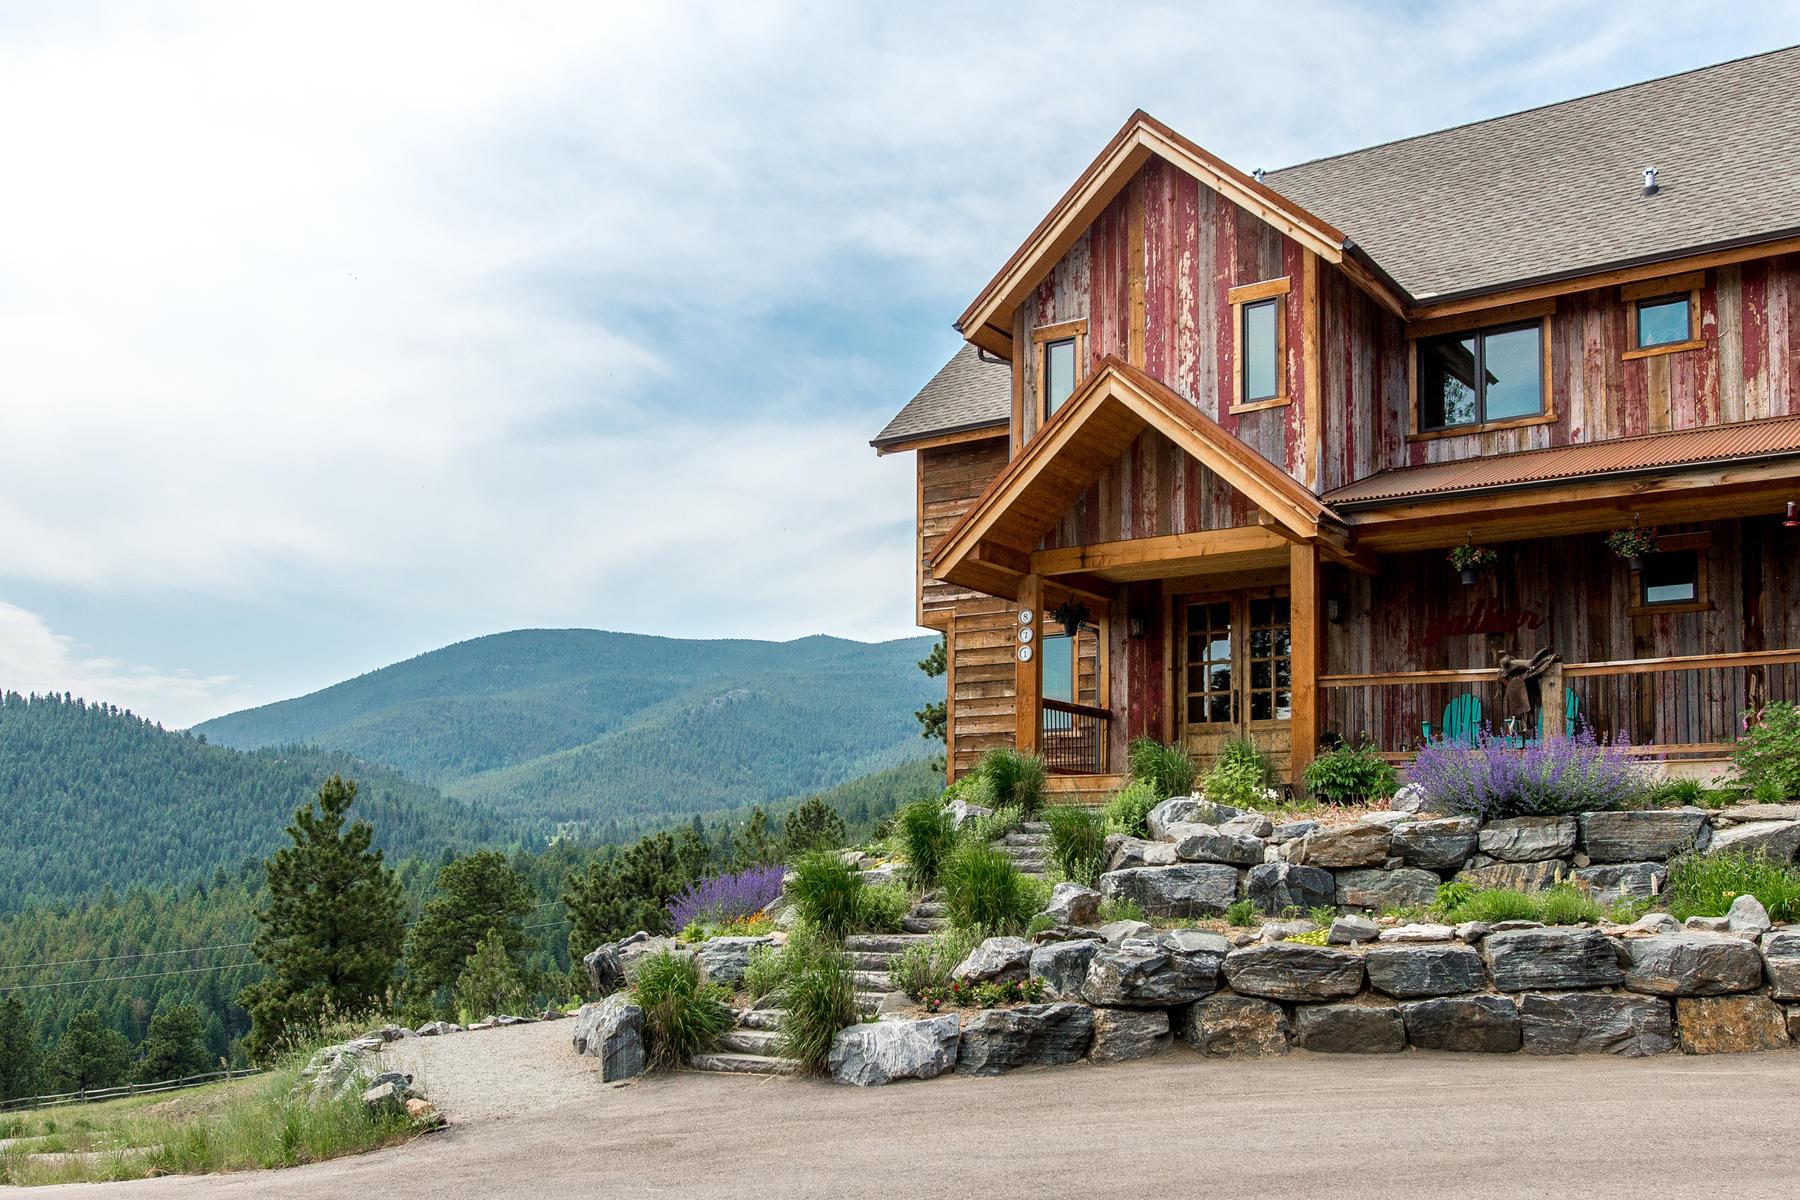 Single Family Home for Active at Custom Built Mountain Retreat 871 Hacienda Road Evergreen, Colorado 80439 United States